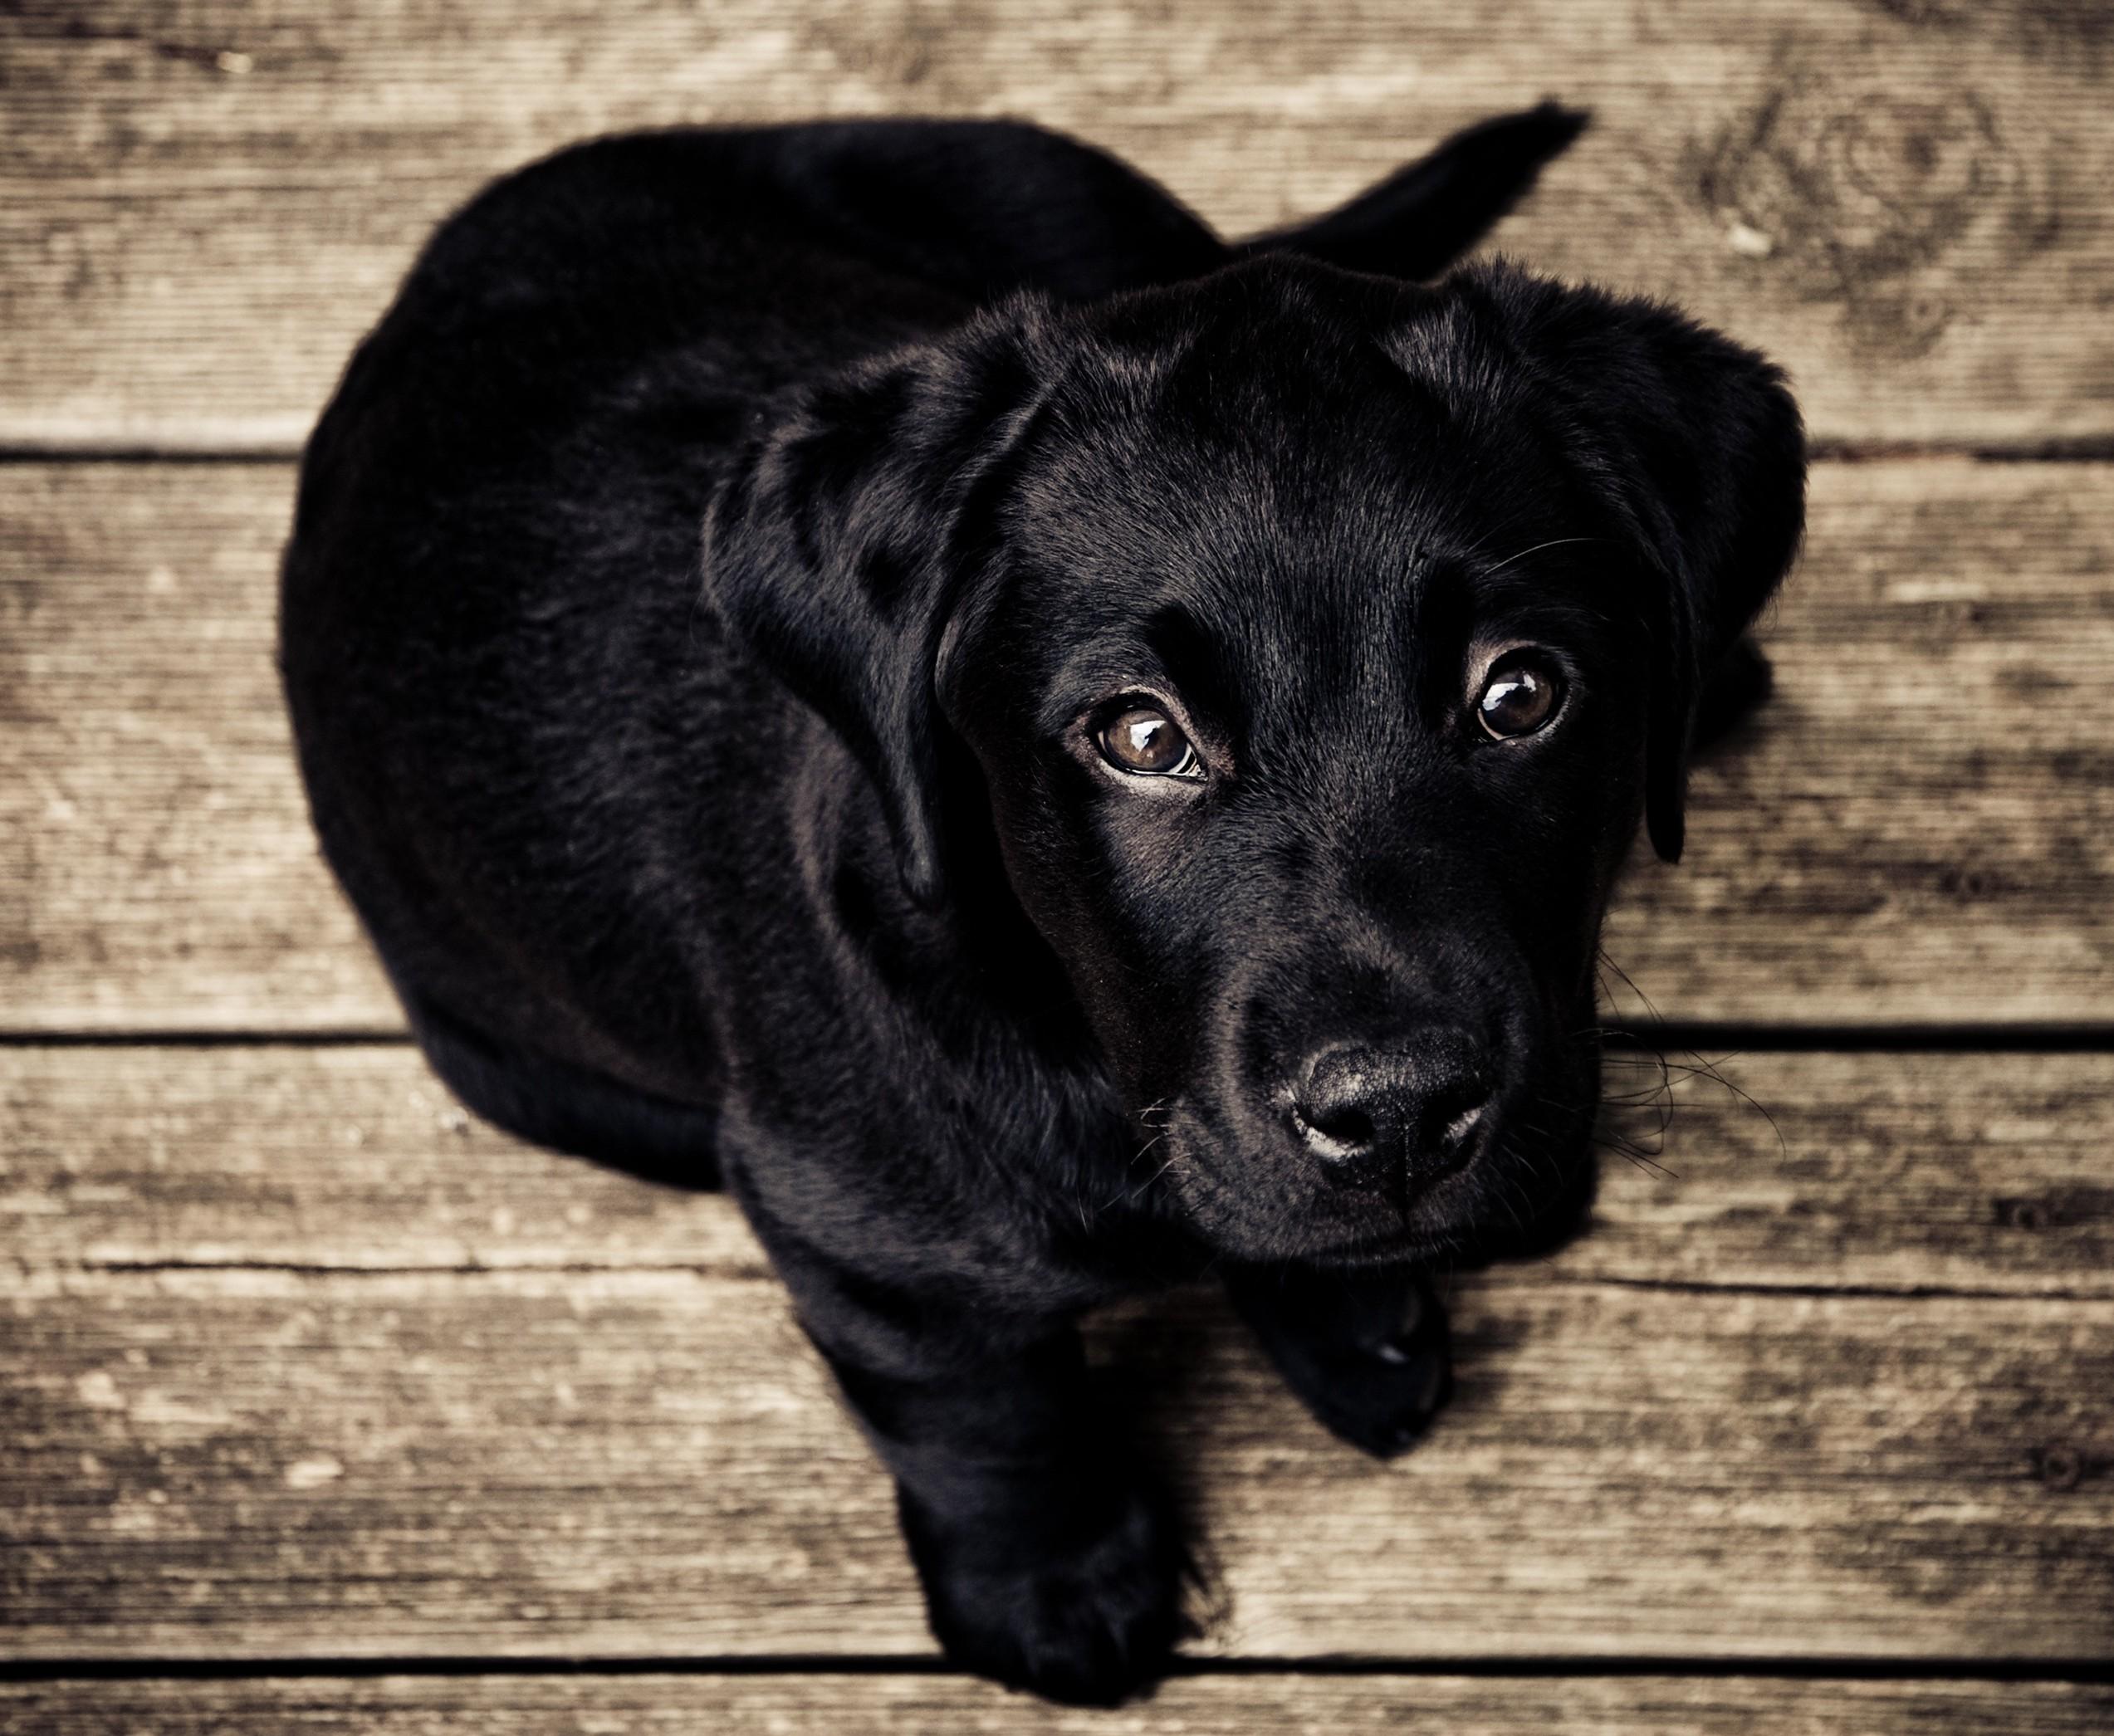 Animal Behaviour - Dog training, puppy training and lifeskills